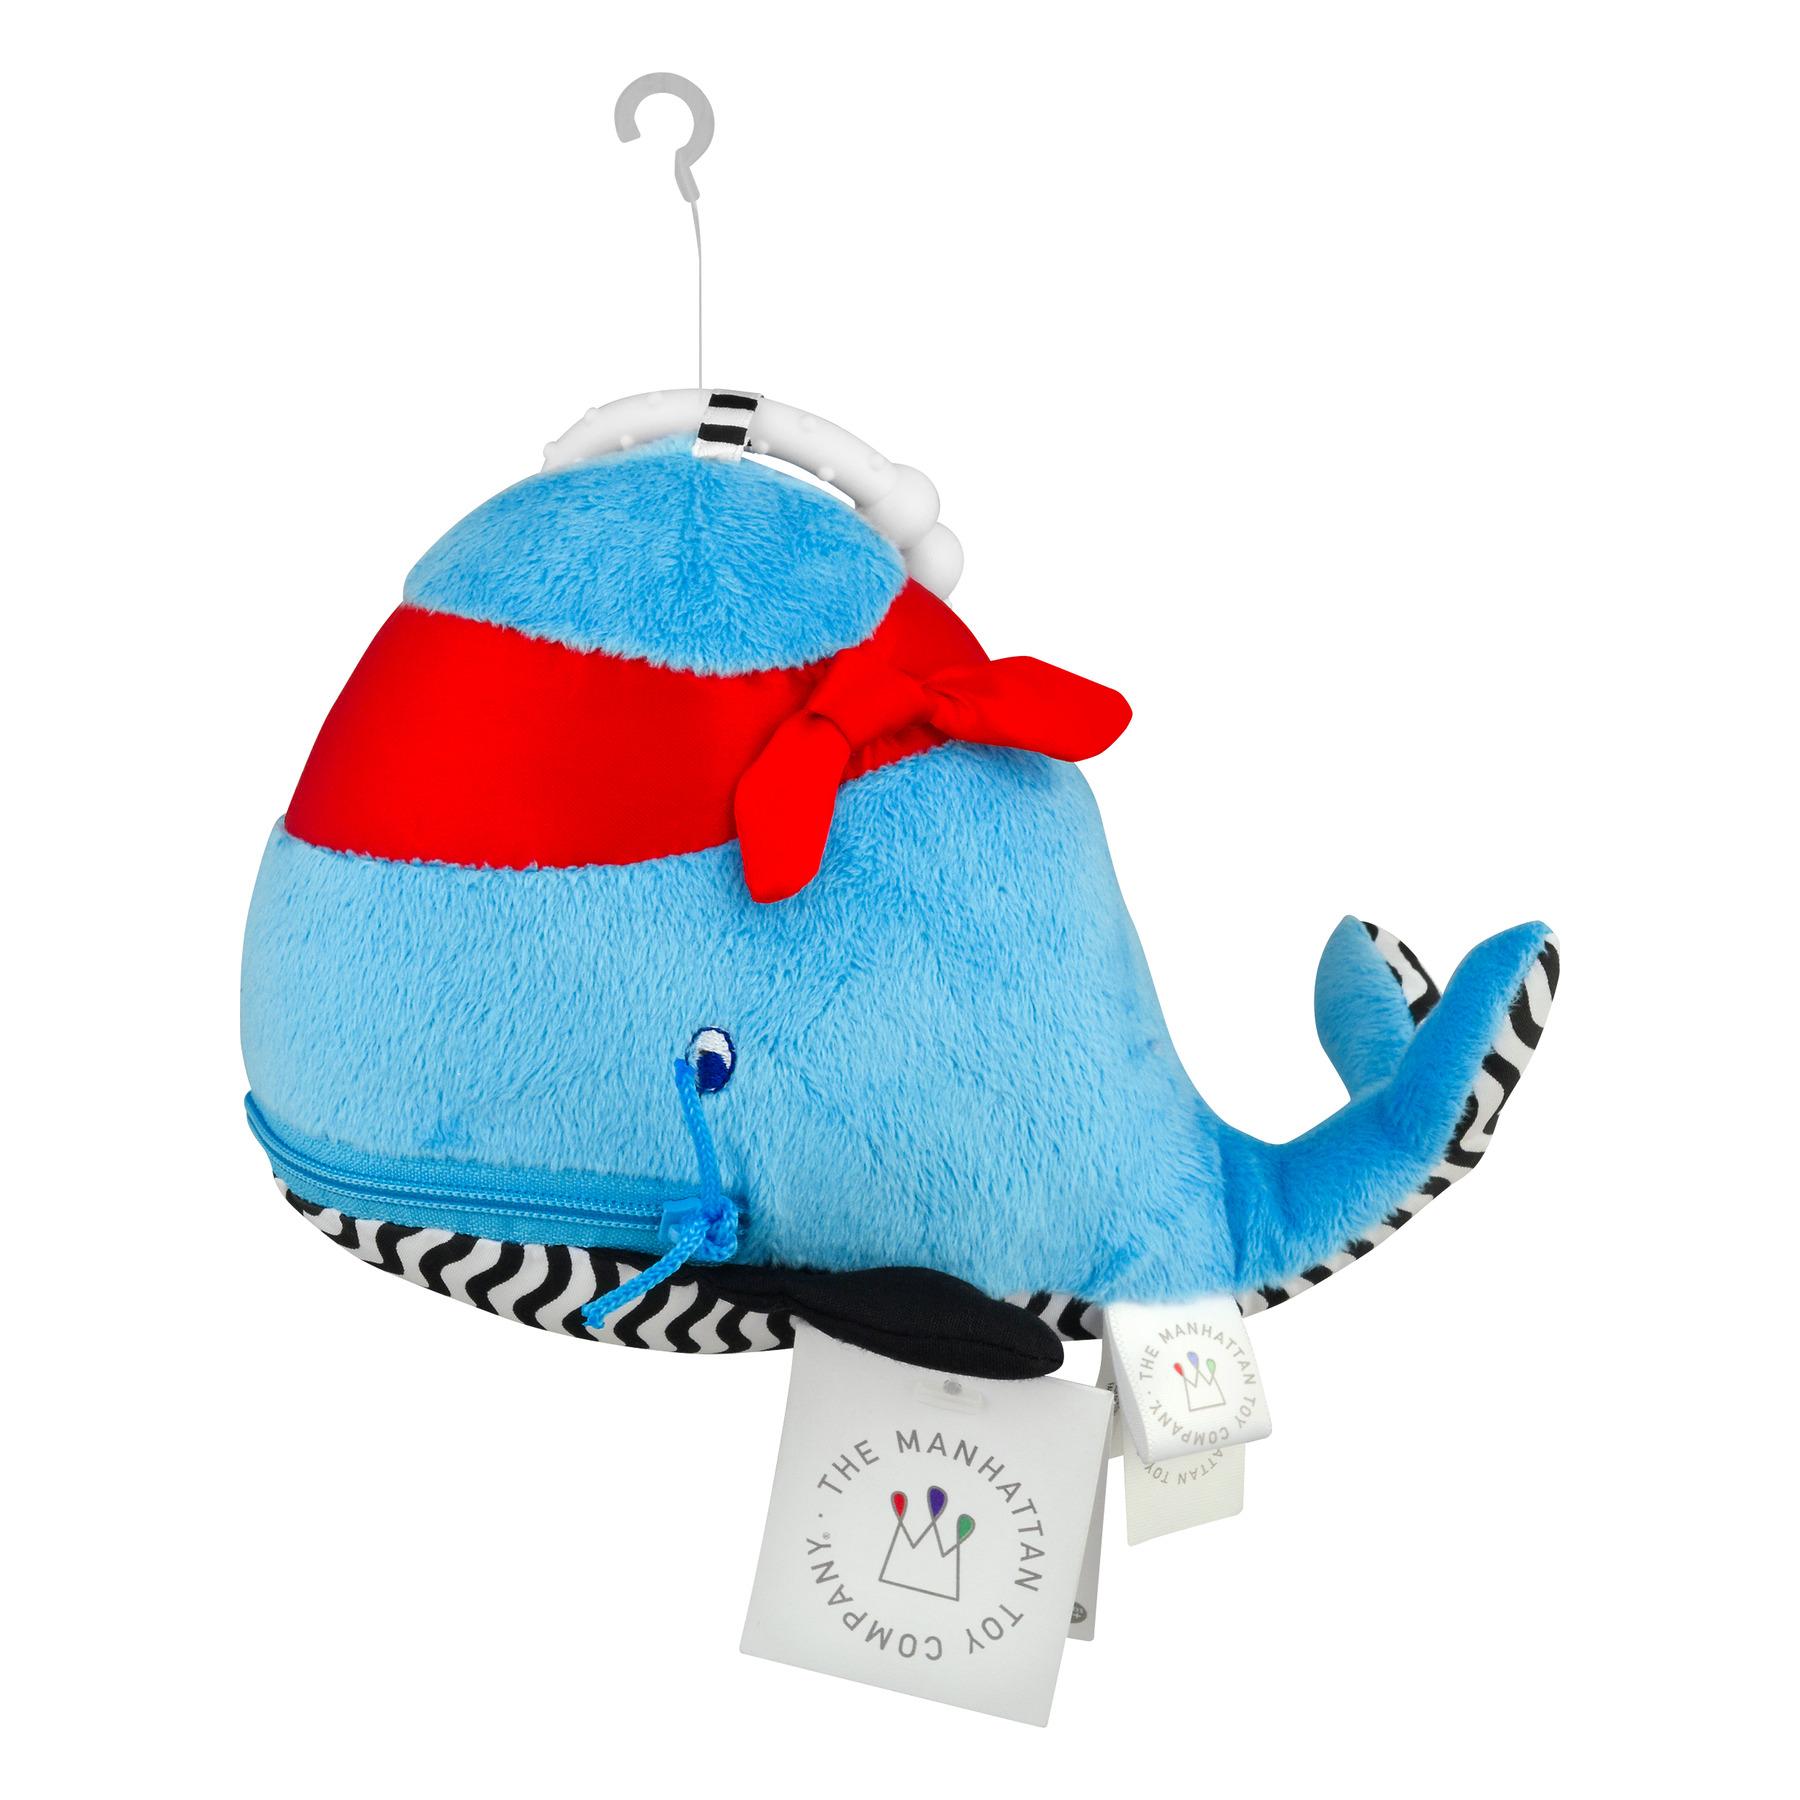 Zip & Play Waldon Whale, 1.0 CT